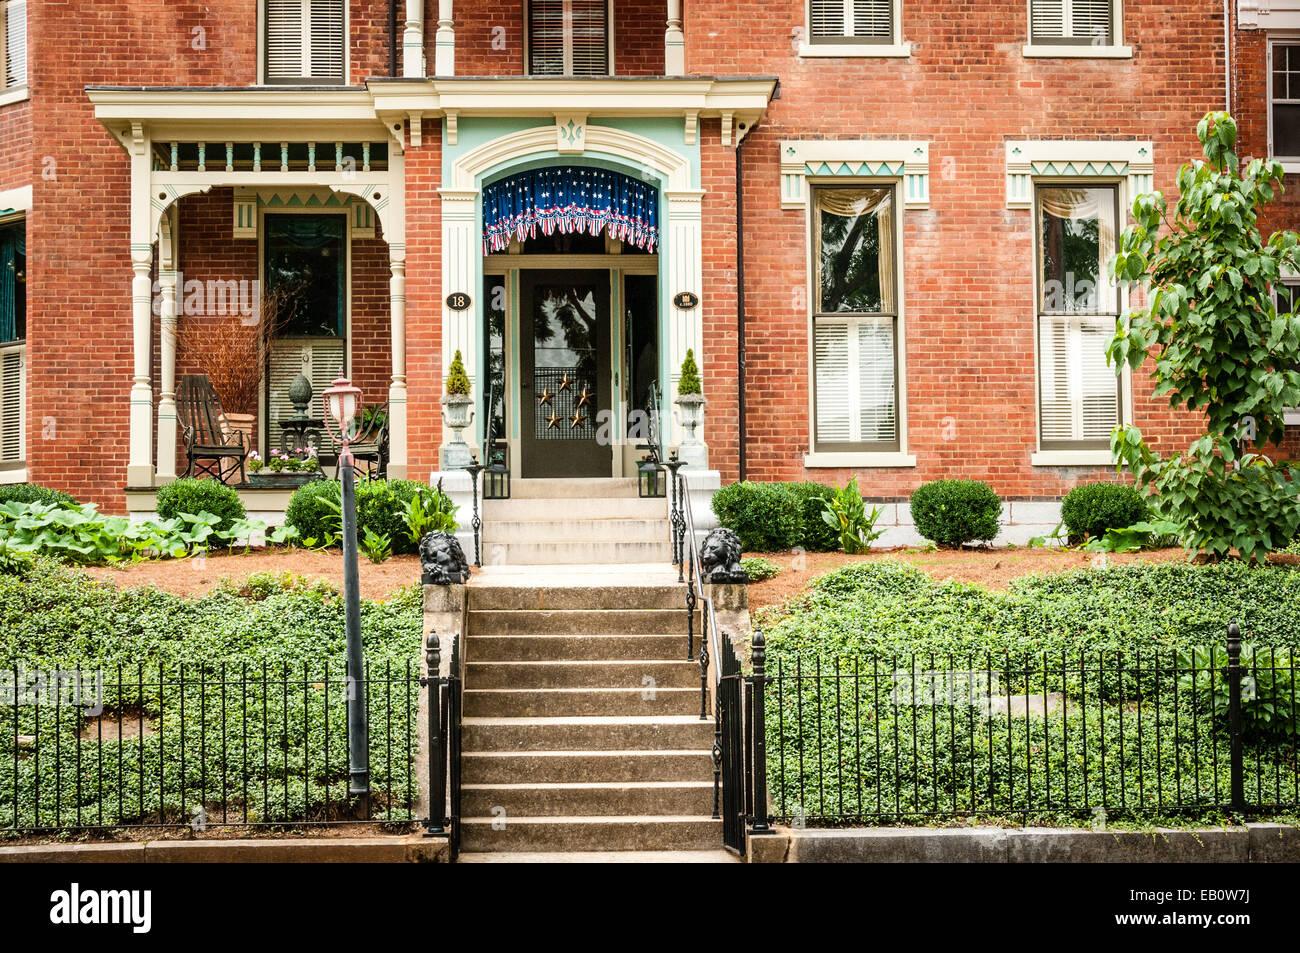 18 Church Street, Staunton, Virginia - Stock Image